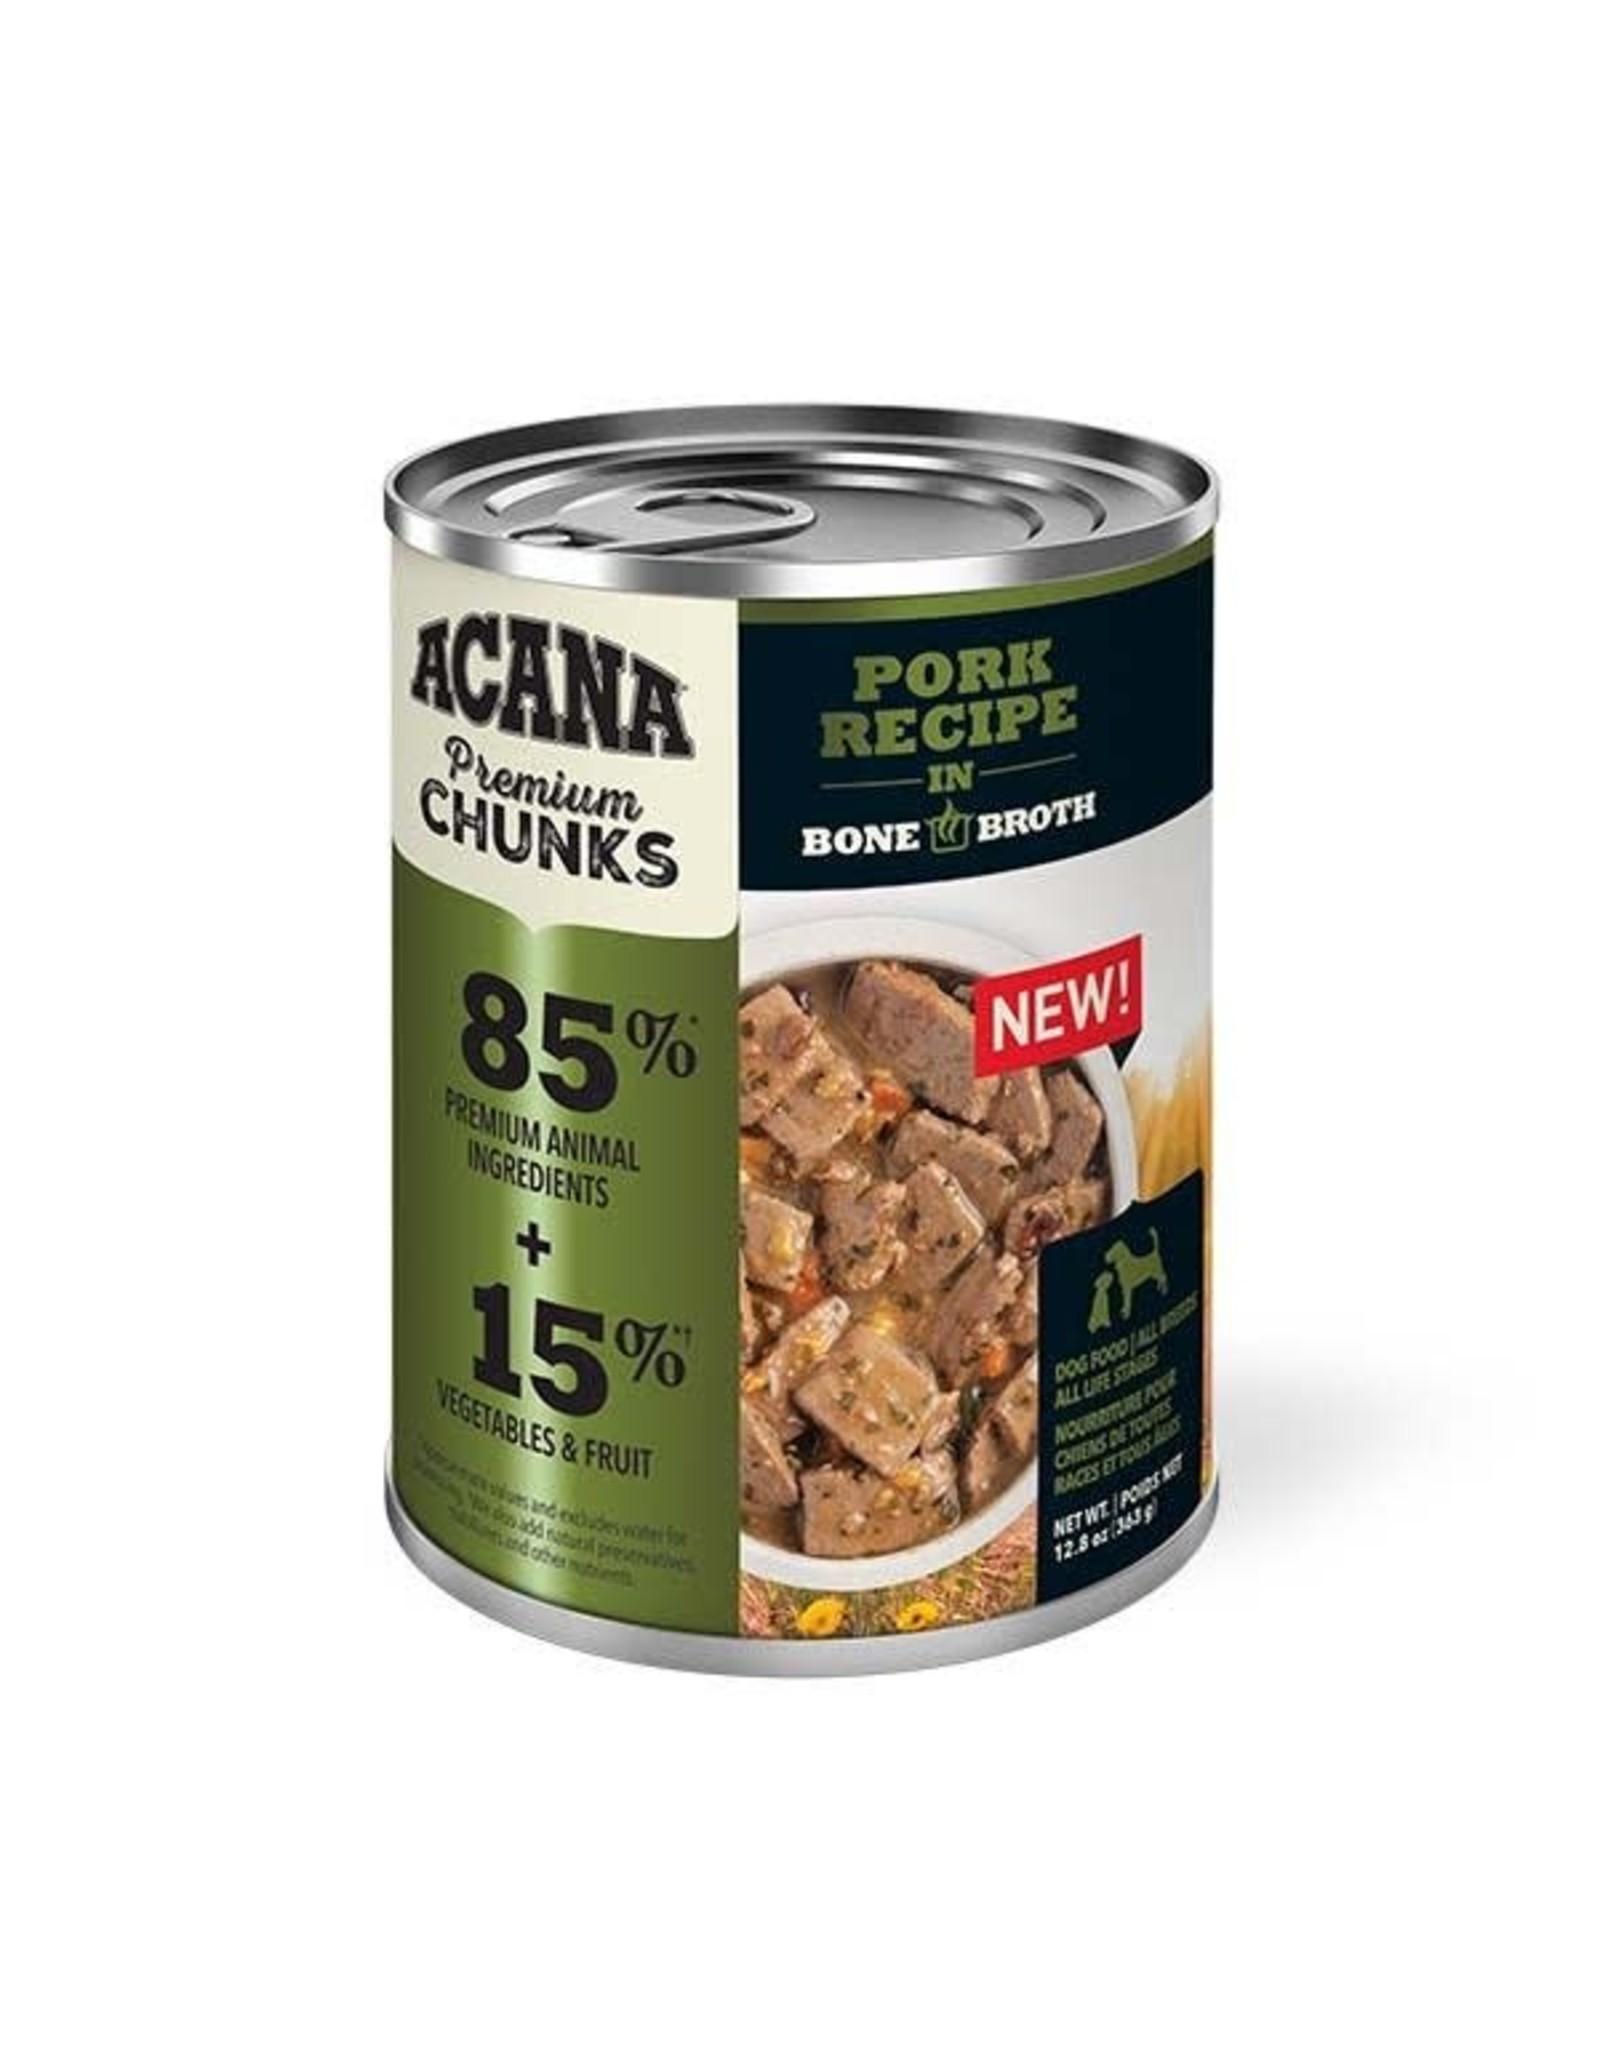 Acana Acana Premium Chunks Wet Dog Food - Pork Recipe in Bone Broth